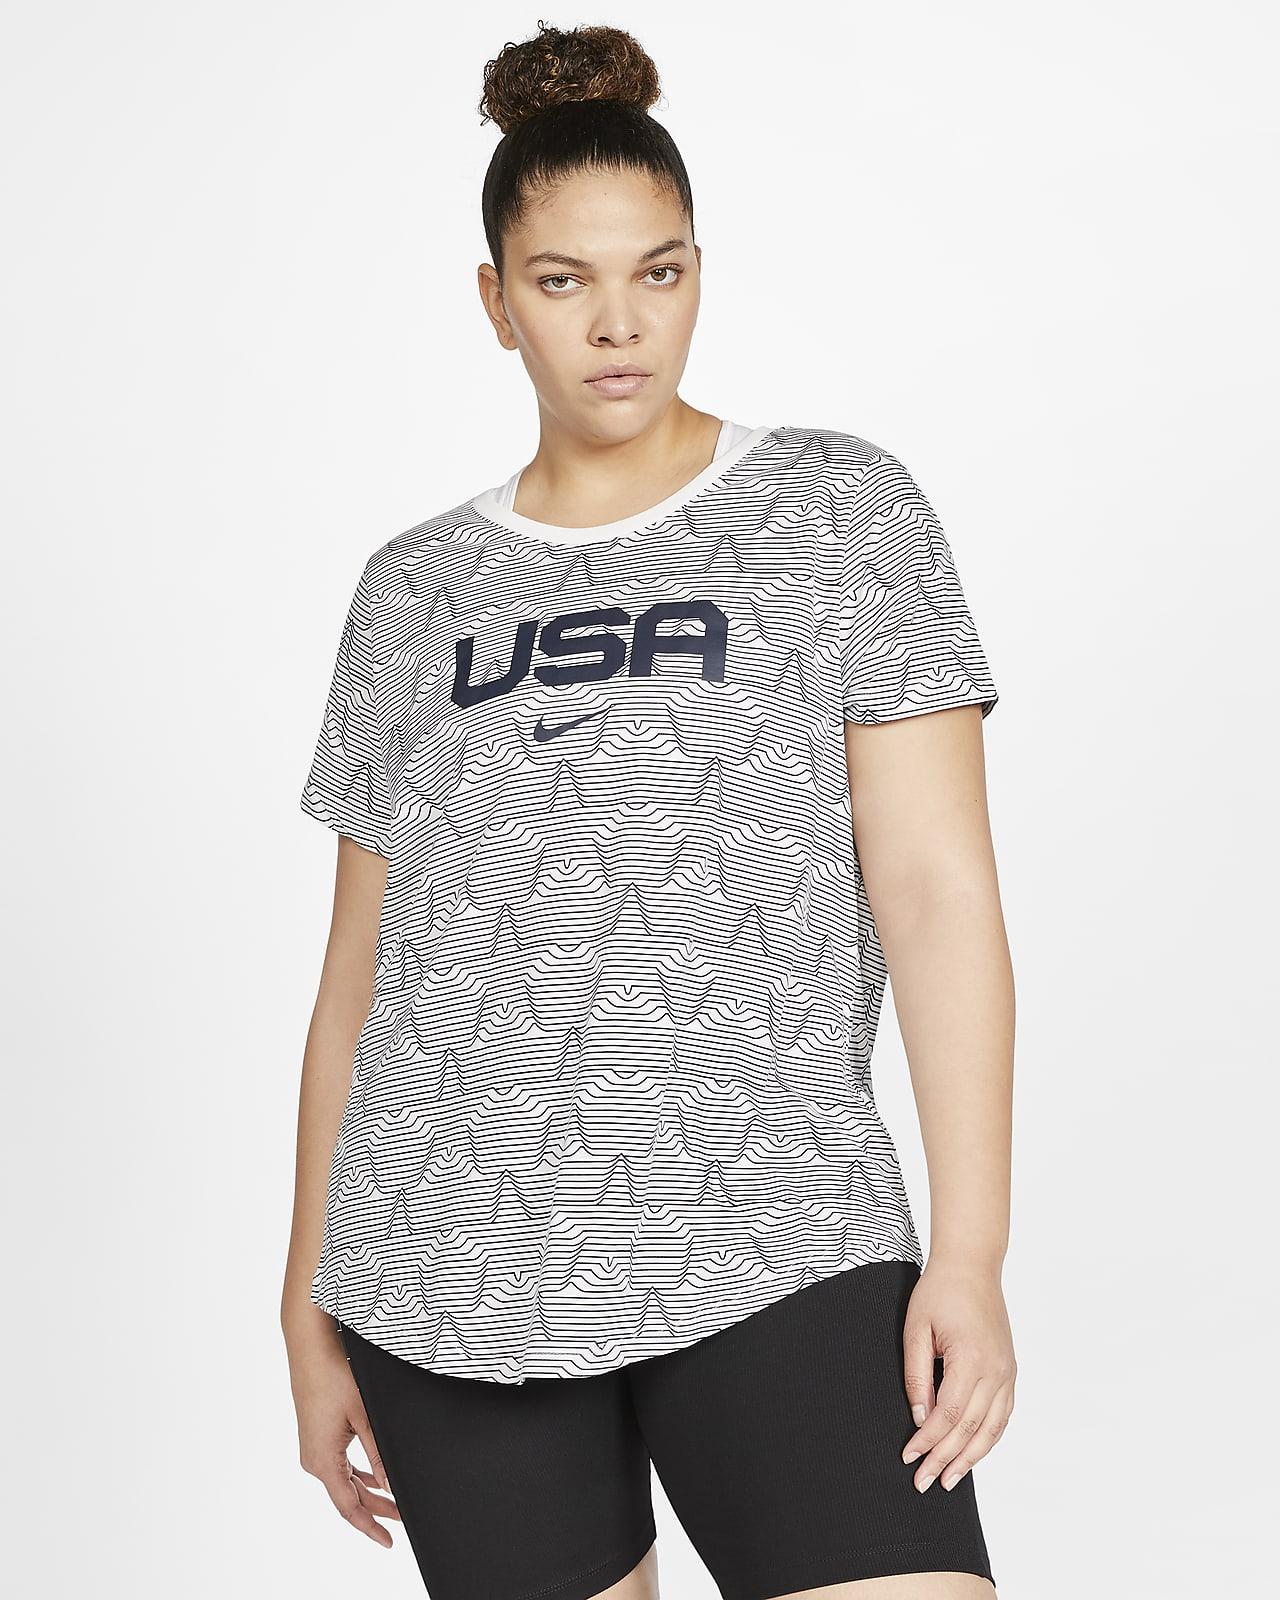 Playera con estampado USA para mujer Nike Sportswear (talla grande)